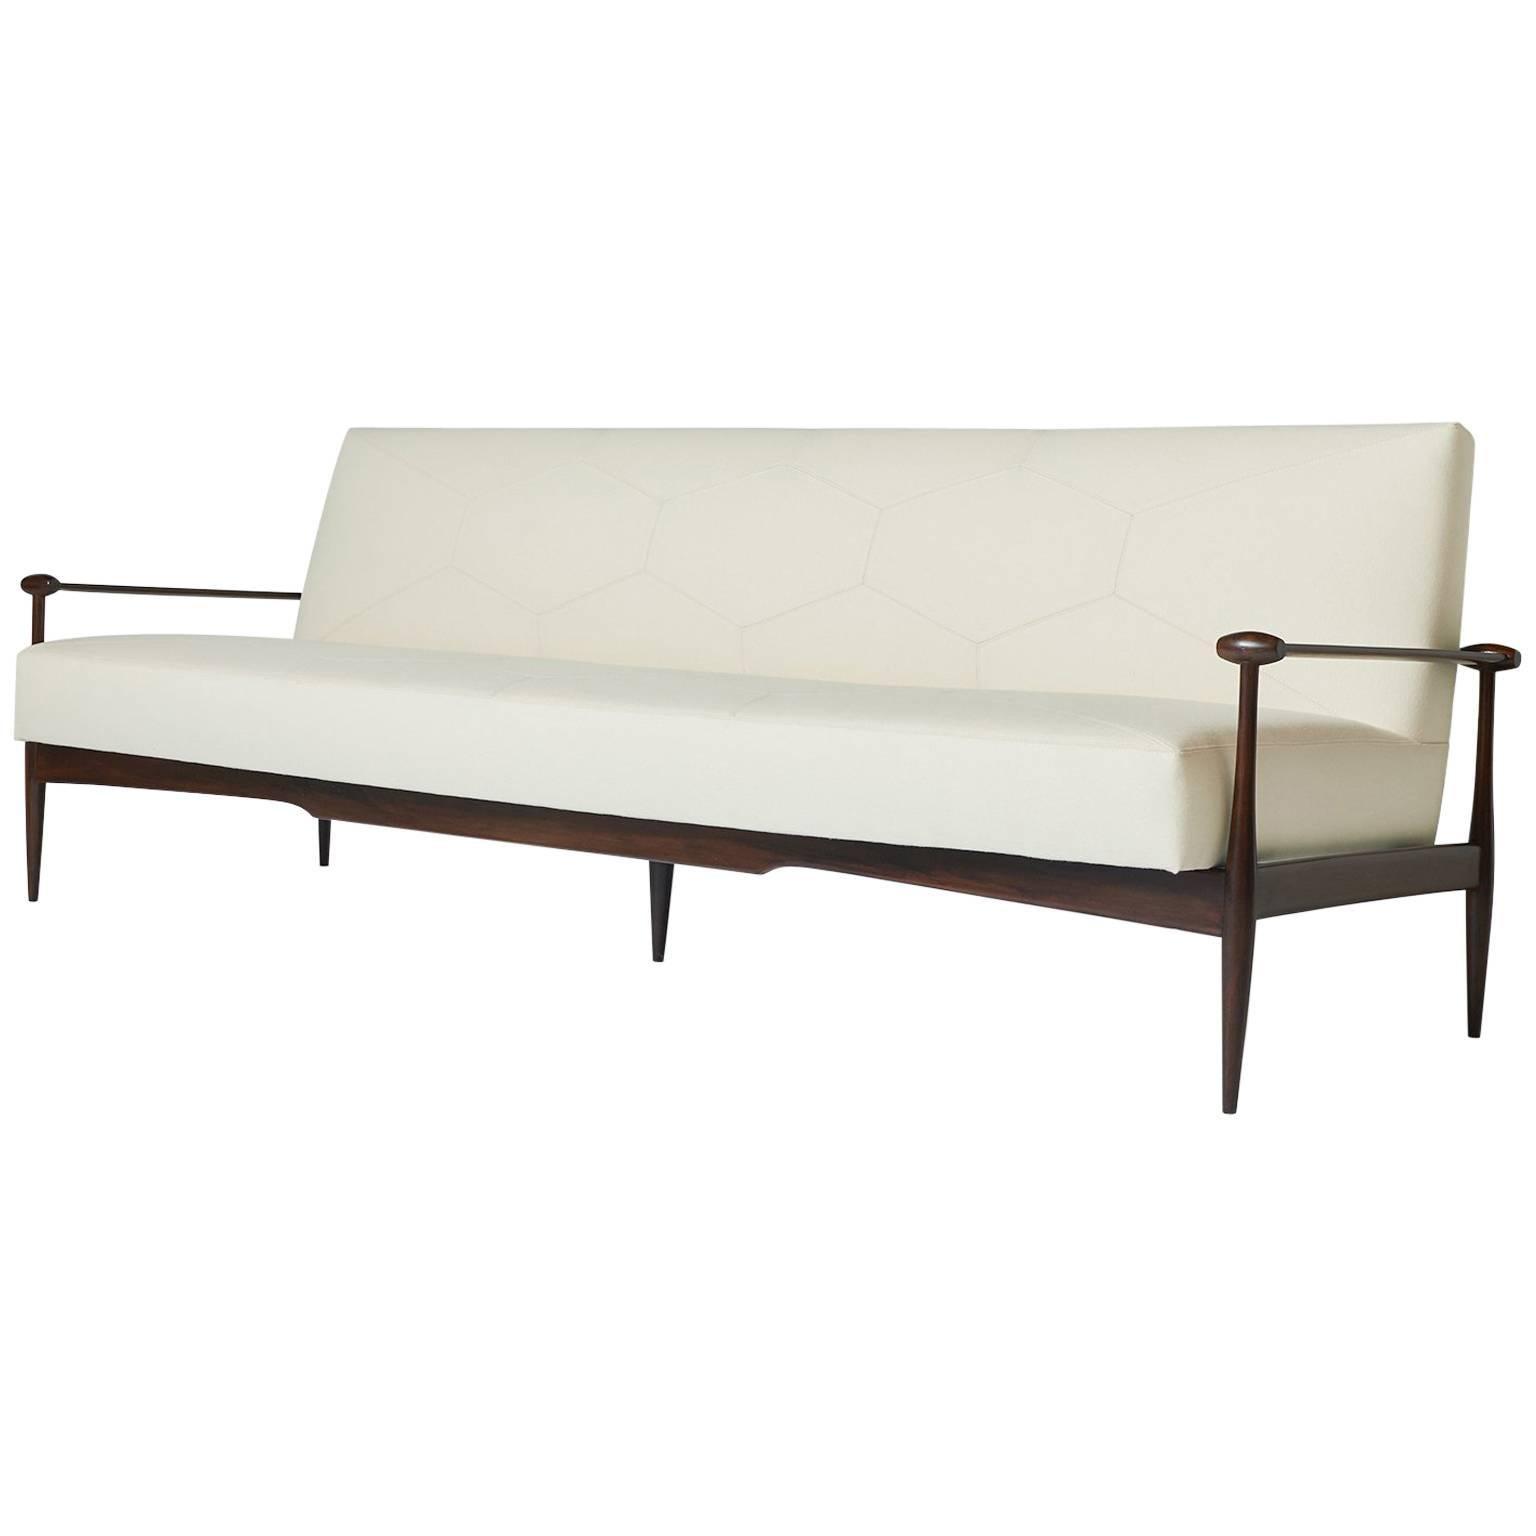 Sofa by Liceu de Arte e Officios